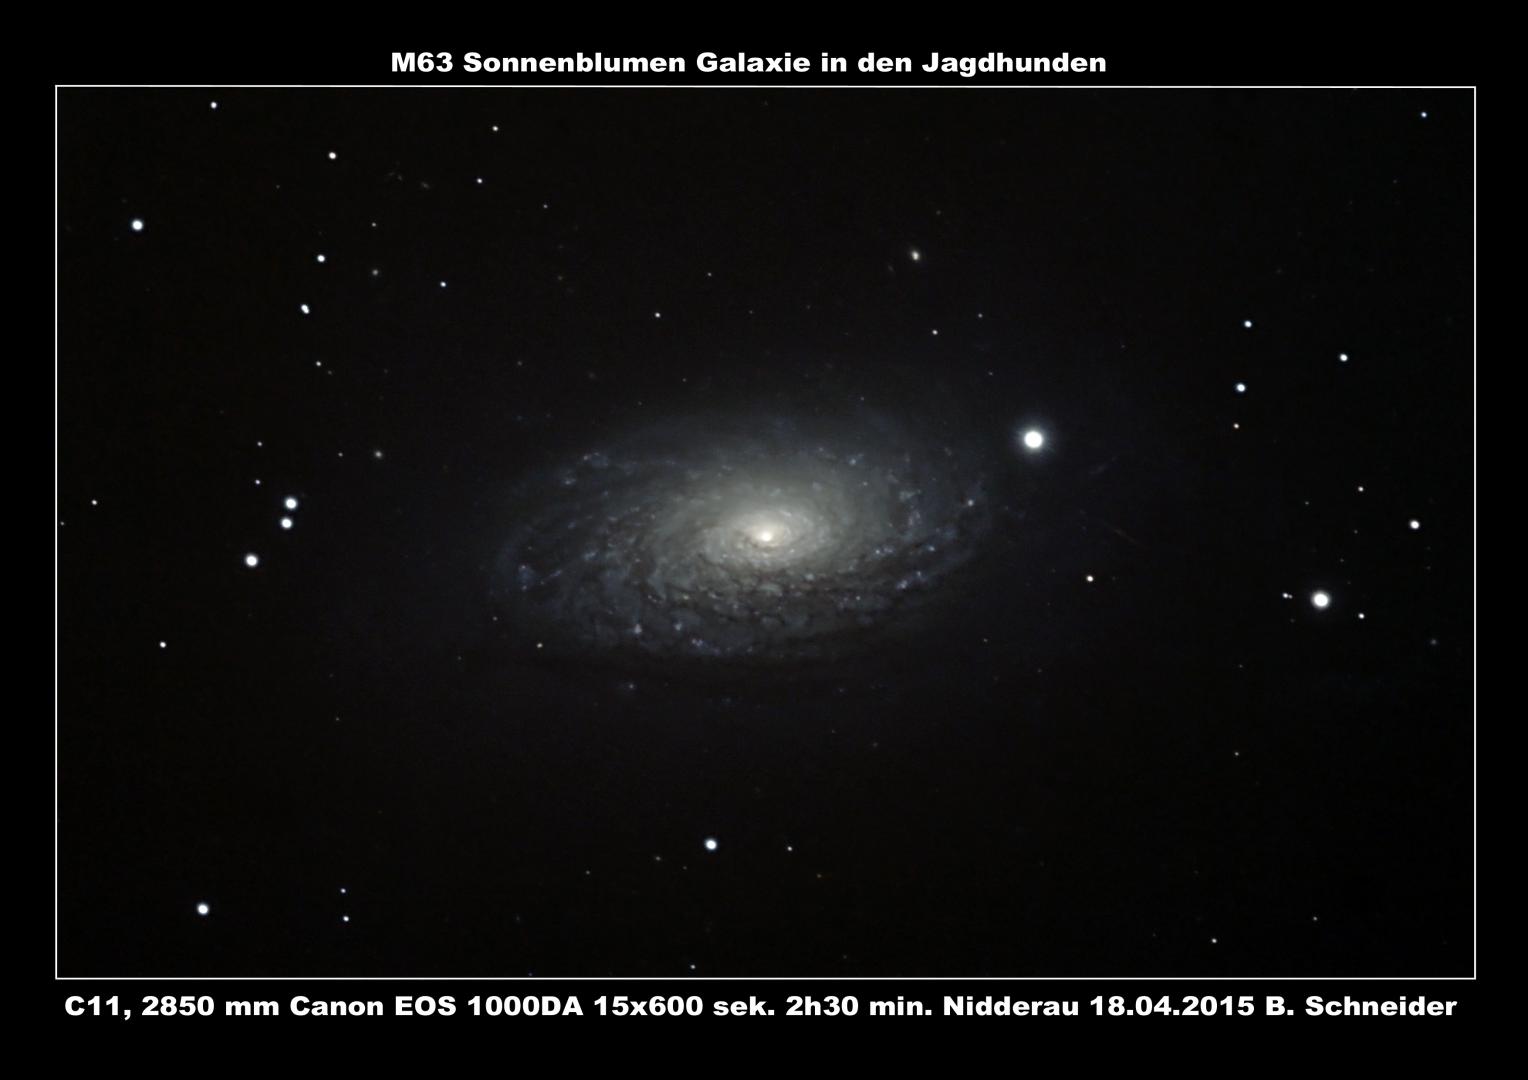 Sonnenblumen Galaxie M63